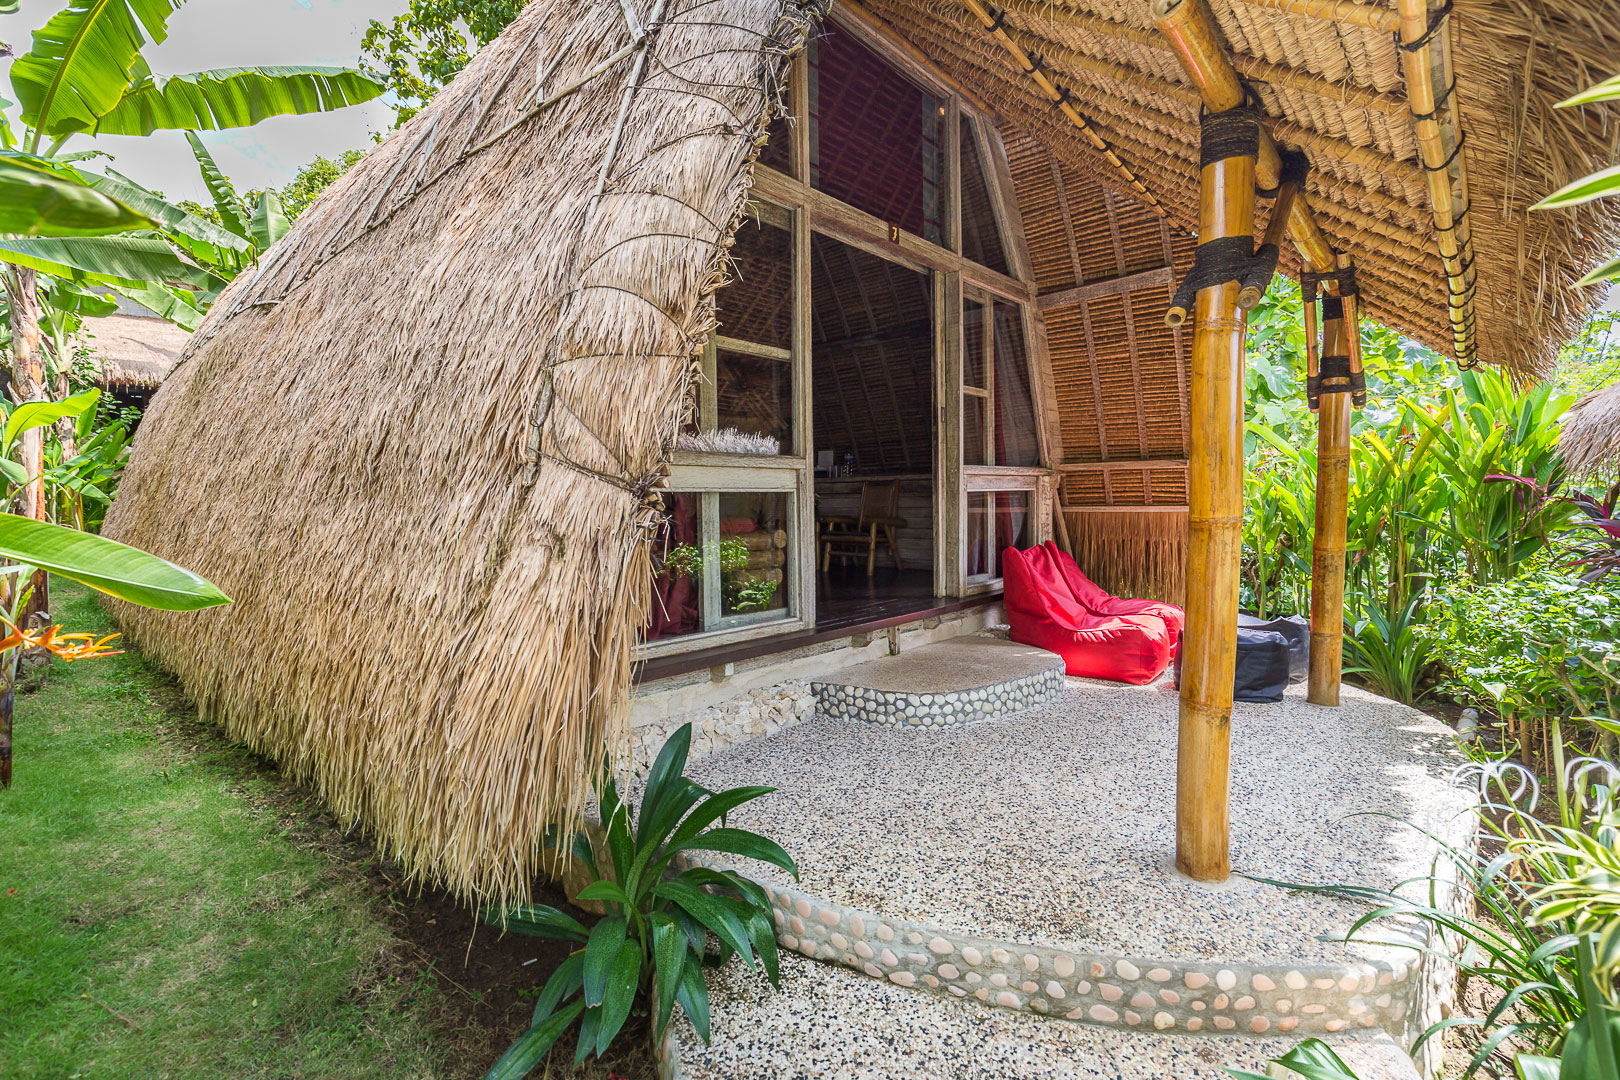 Location-bungalows-maison-hote-hotel-milos-home-L7-rhodochrosite